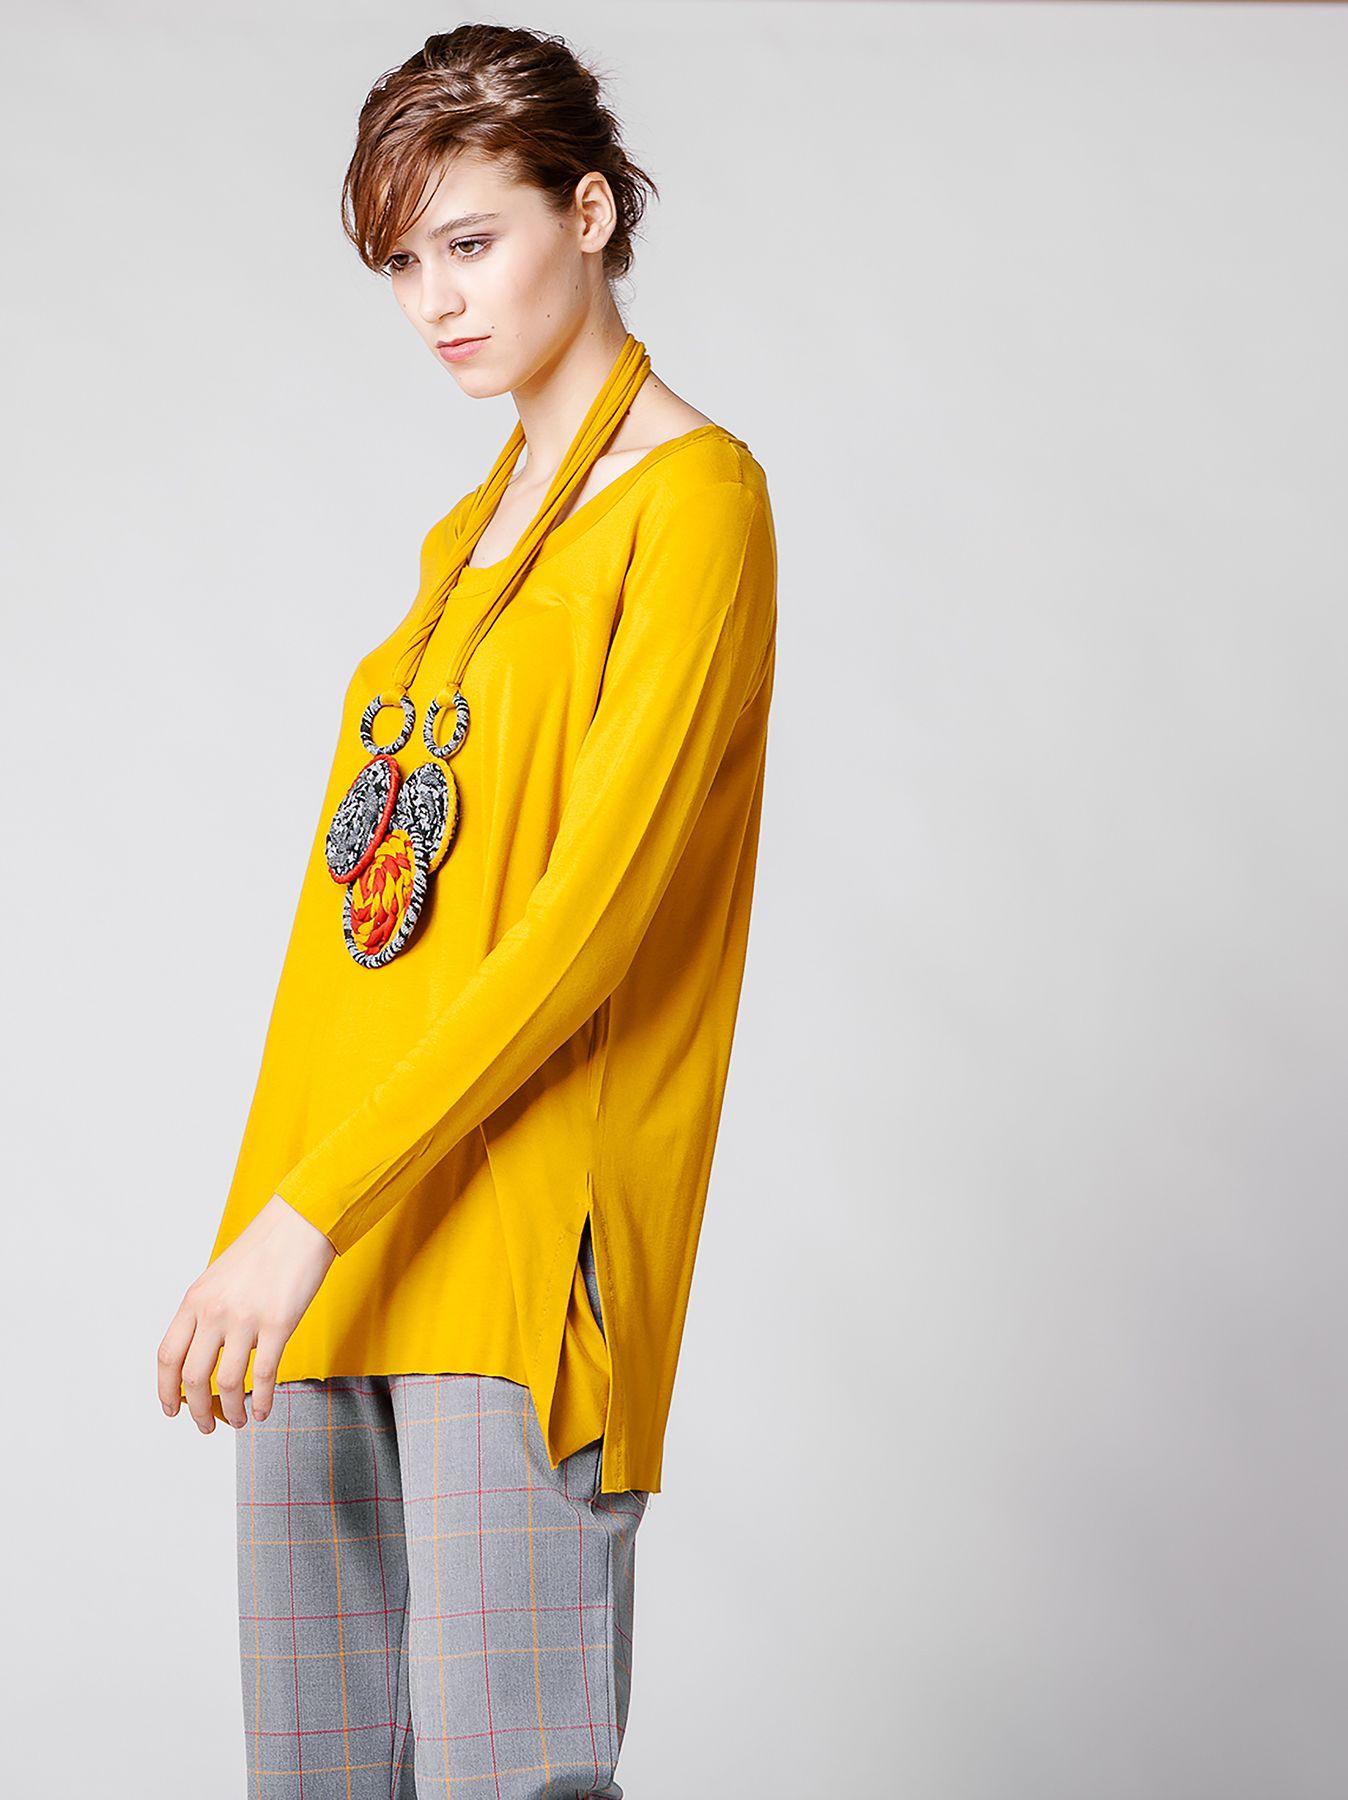 T-shirt in jersey con girocollo torsion